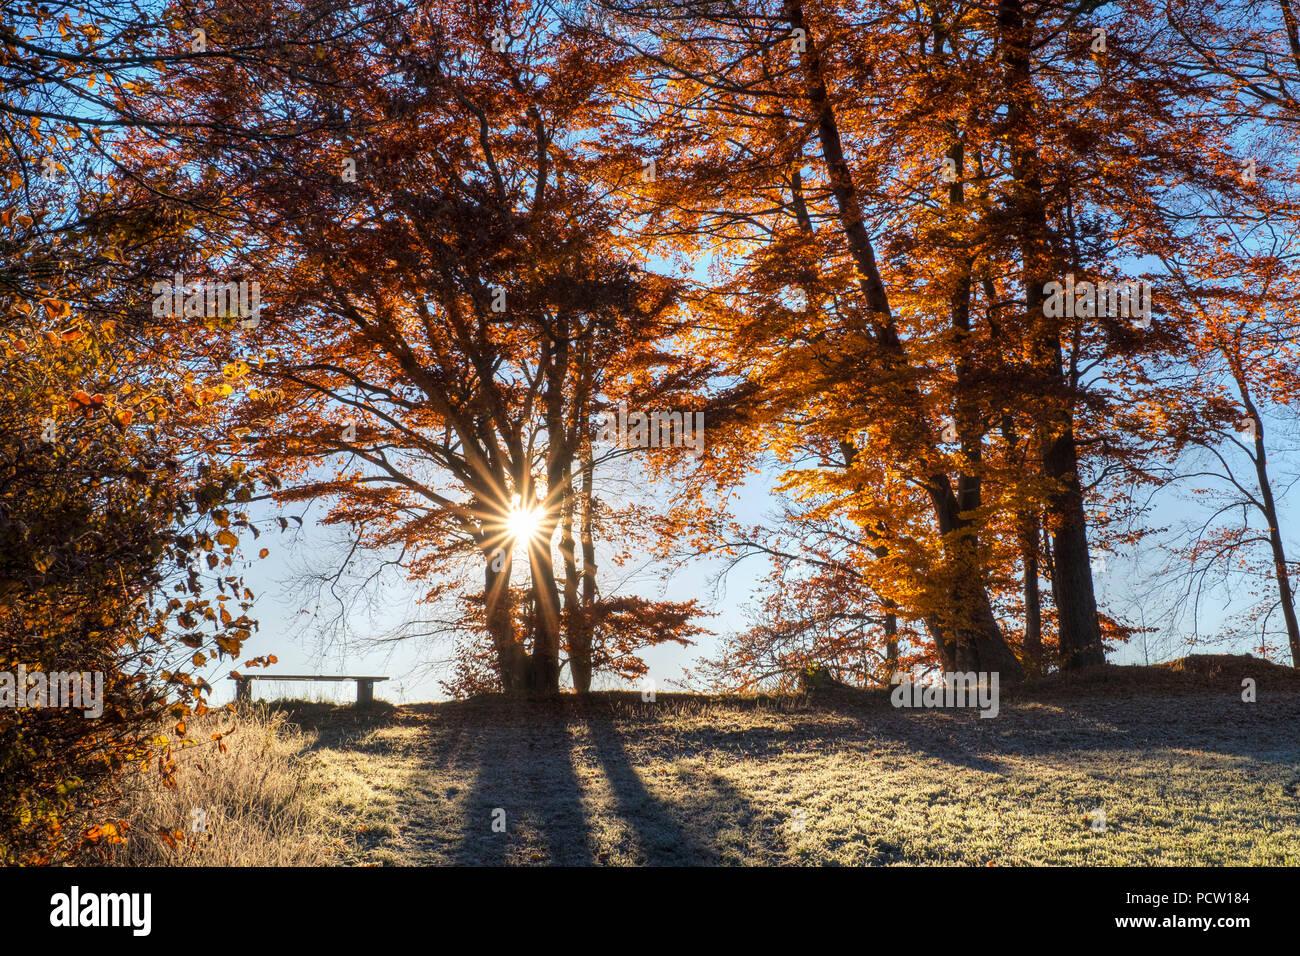 Sunrise with autumnal beech trees, Schlederloh near Icking, Upper Bavaria, Bavaria, Germany Stock Photo